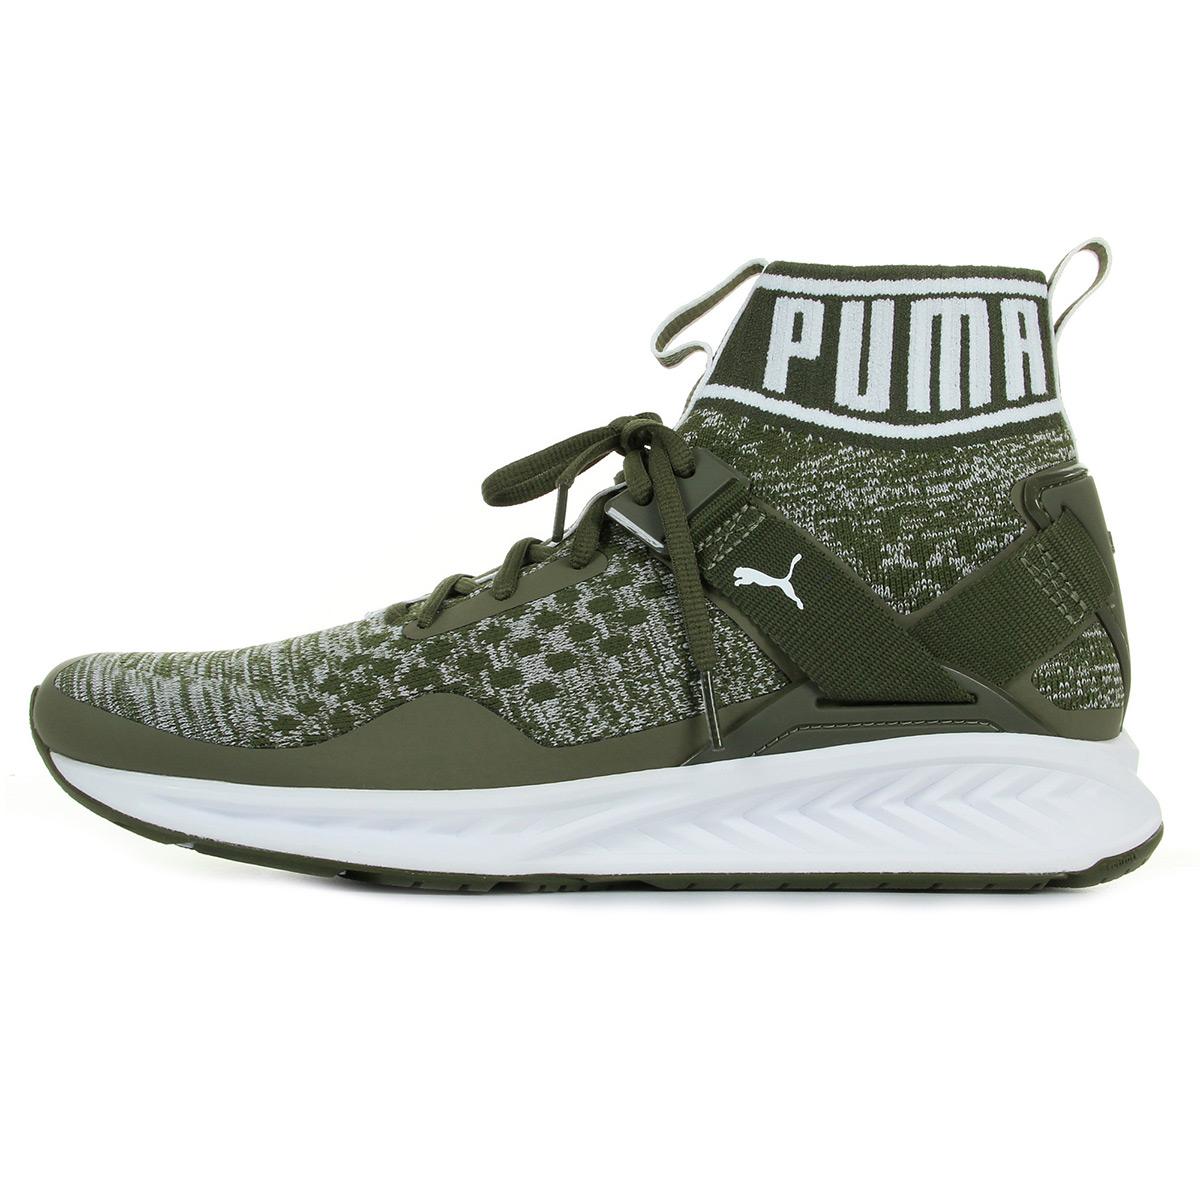 Puma Ignite Evoknit 18969714, Basket - 43 EU